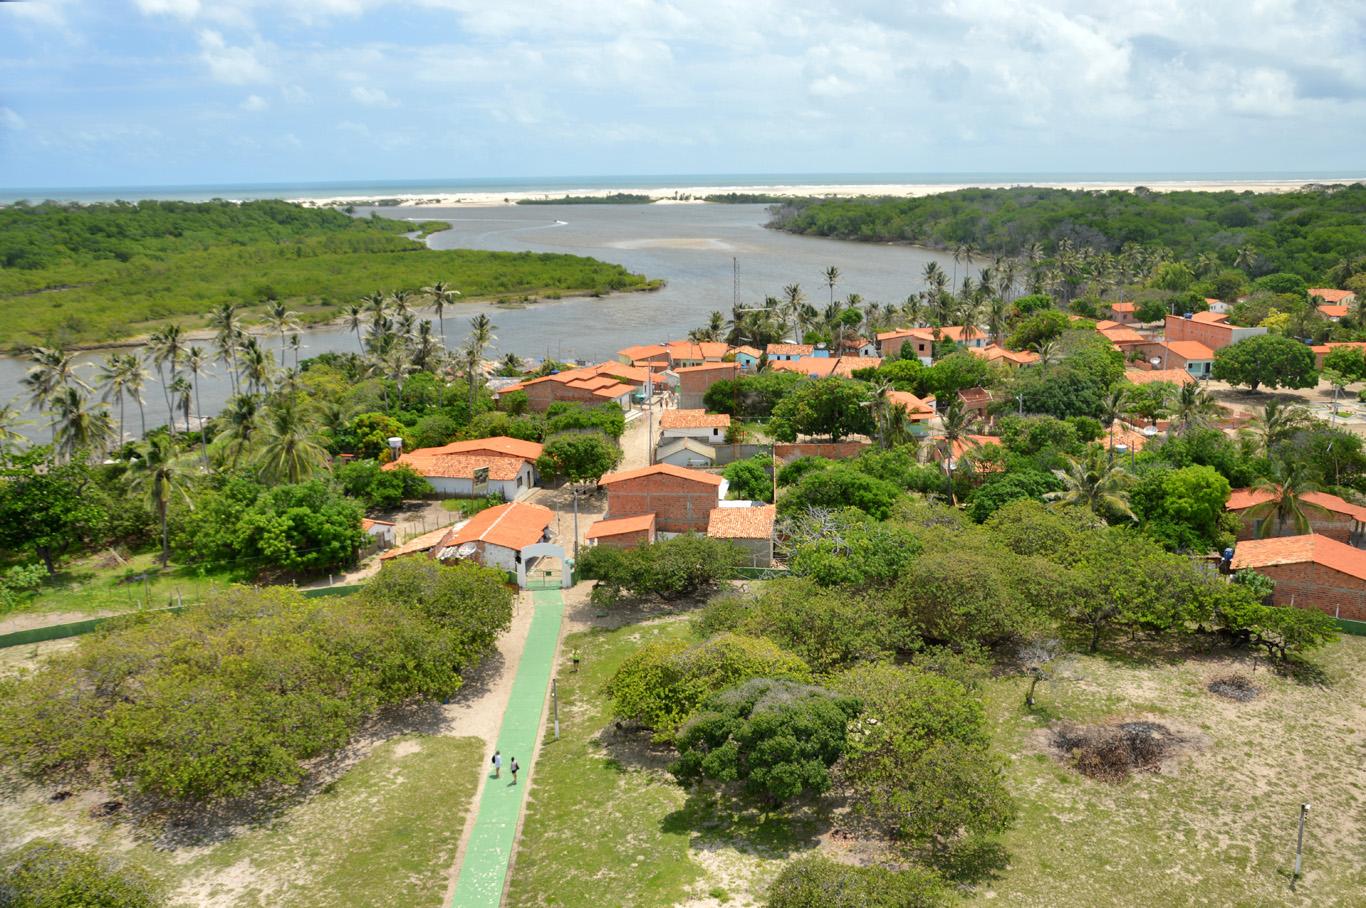 Mandacaru village